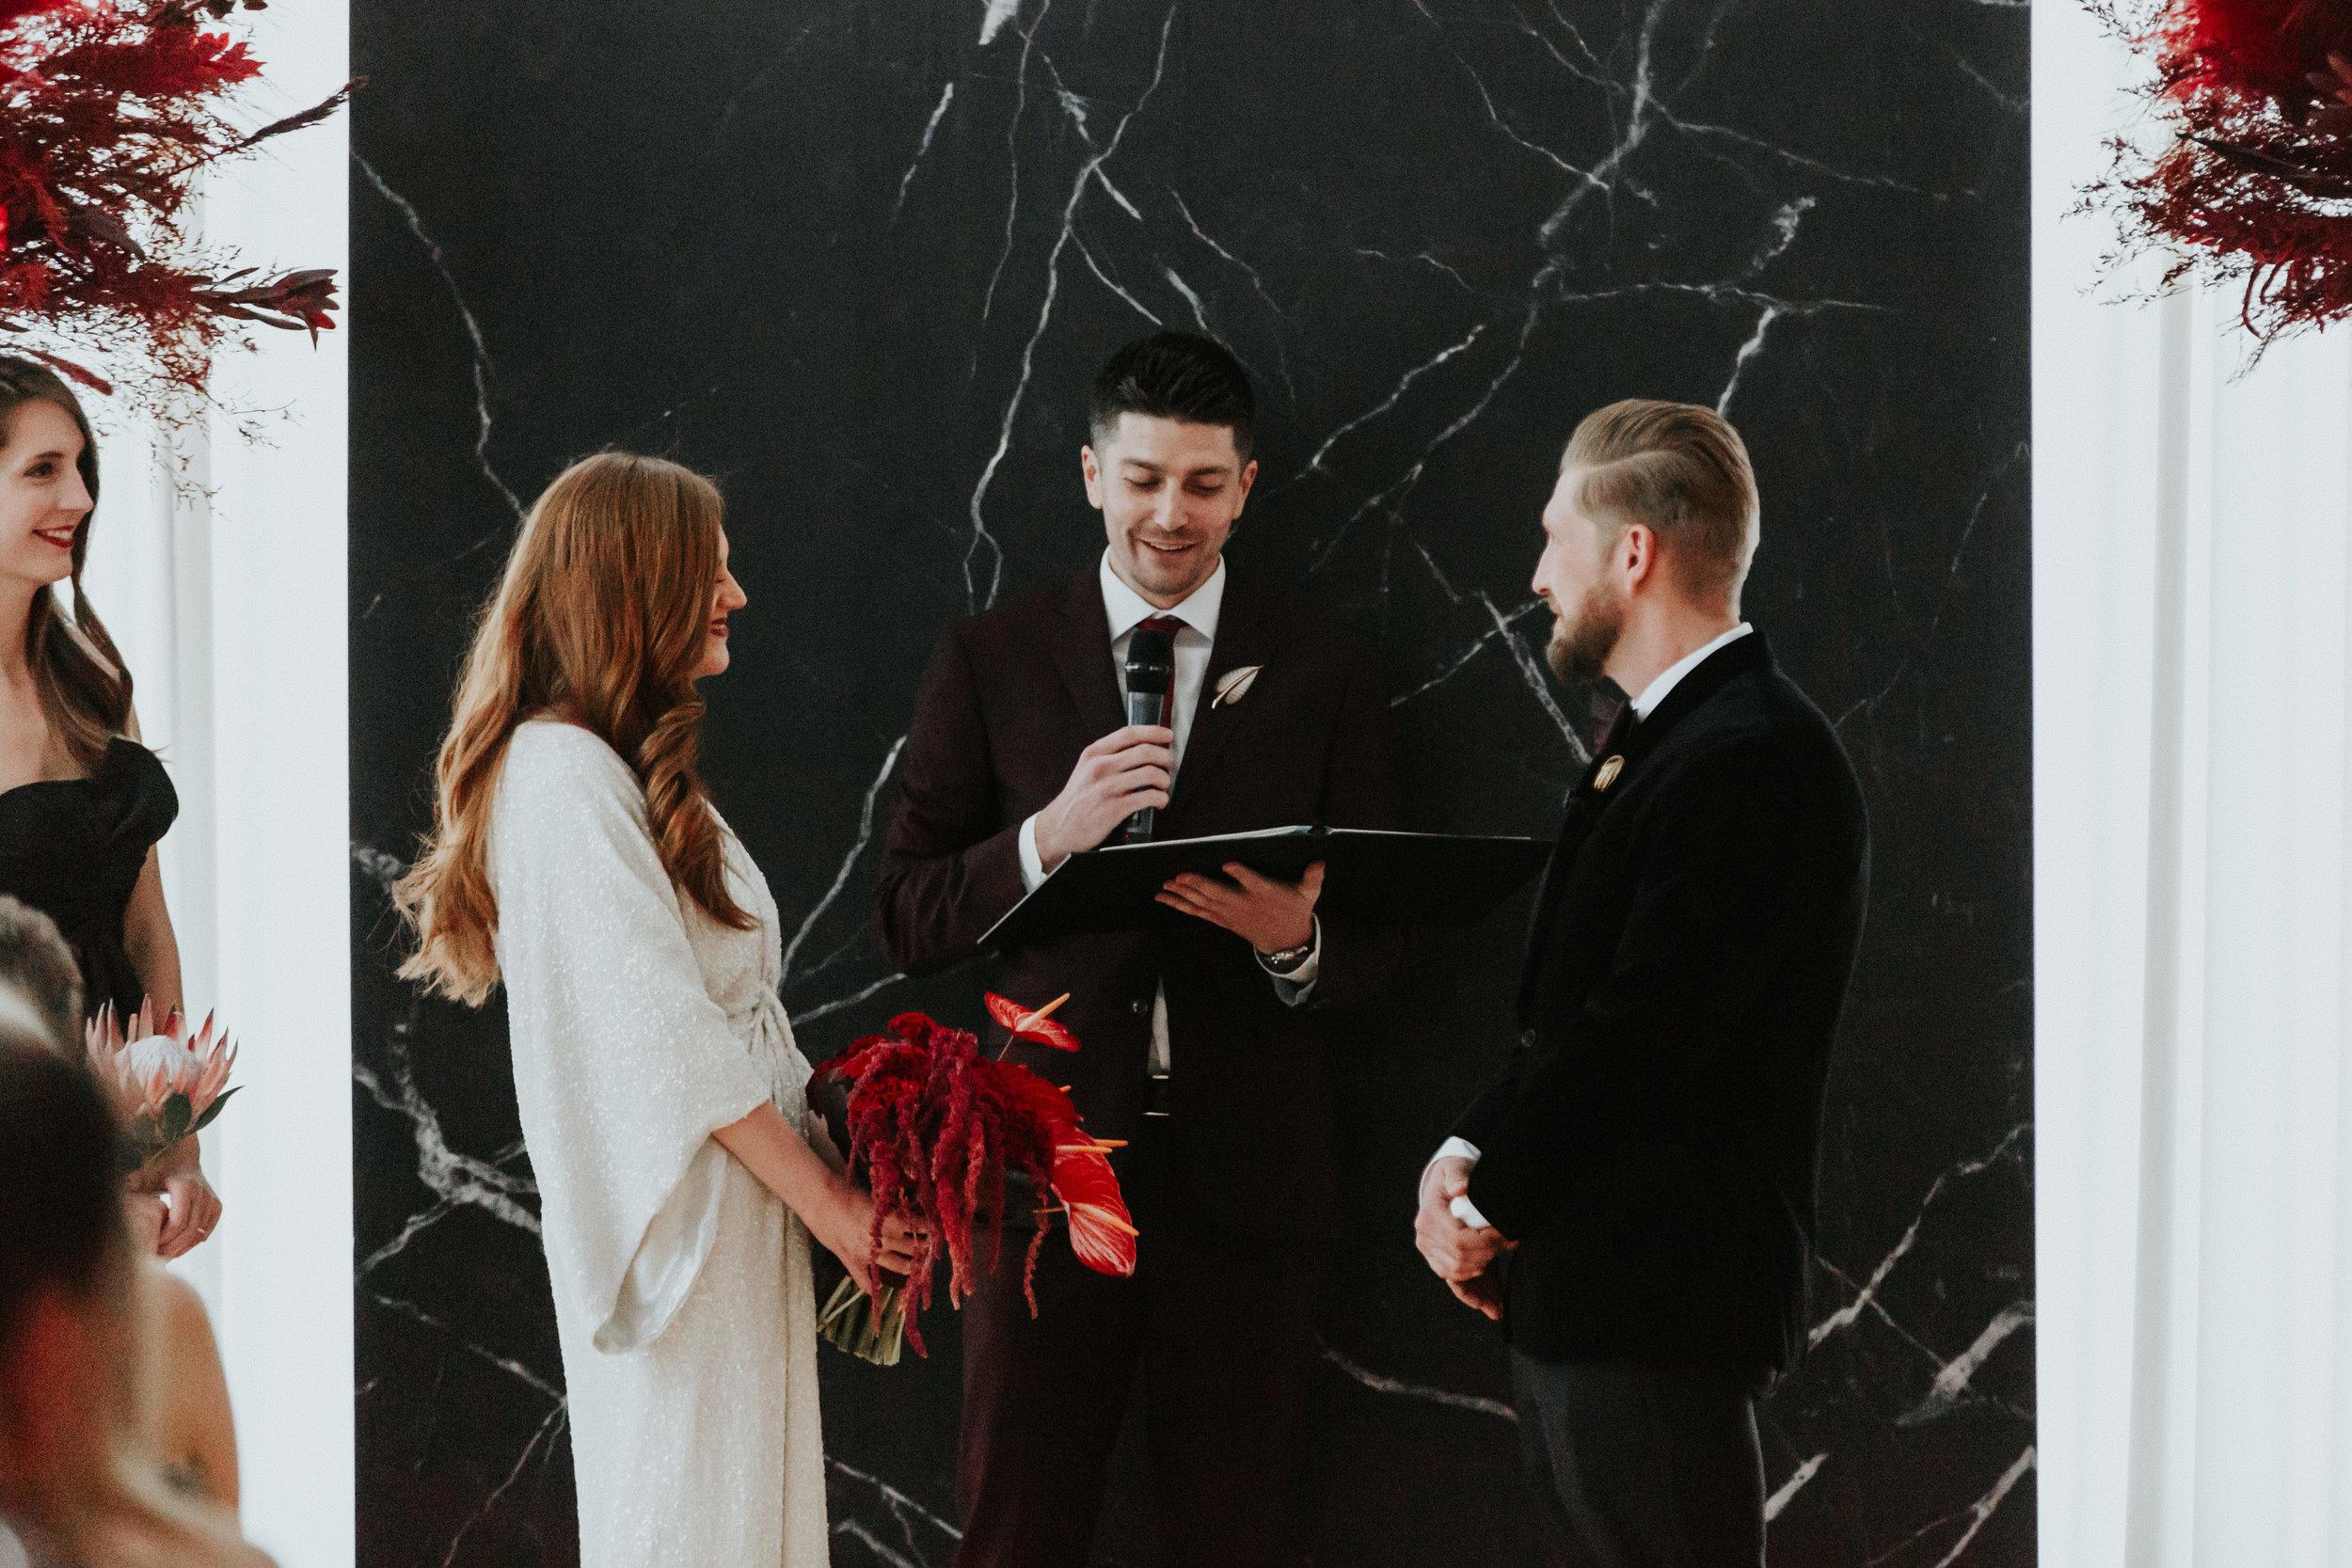 edgy wedding photographer chicago illinois